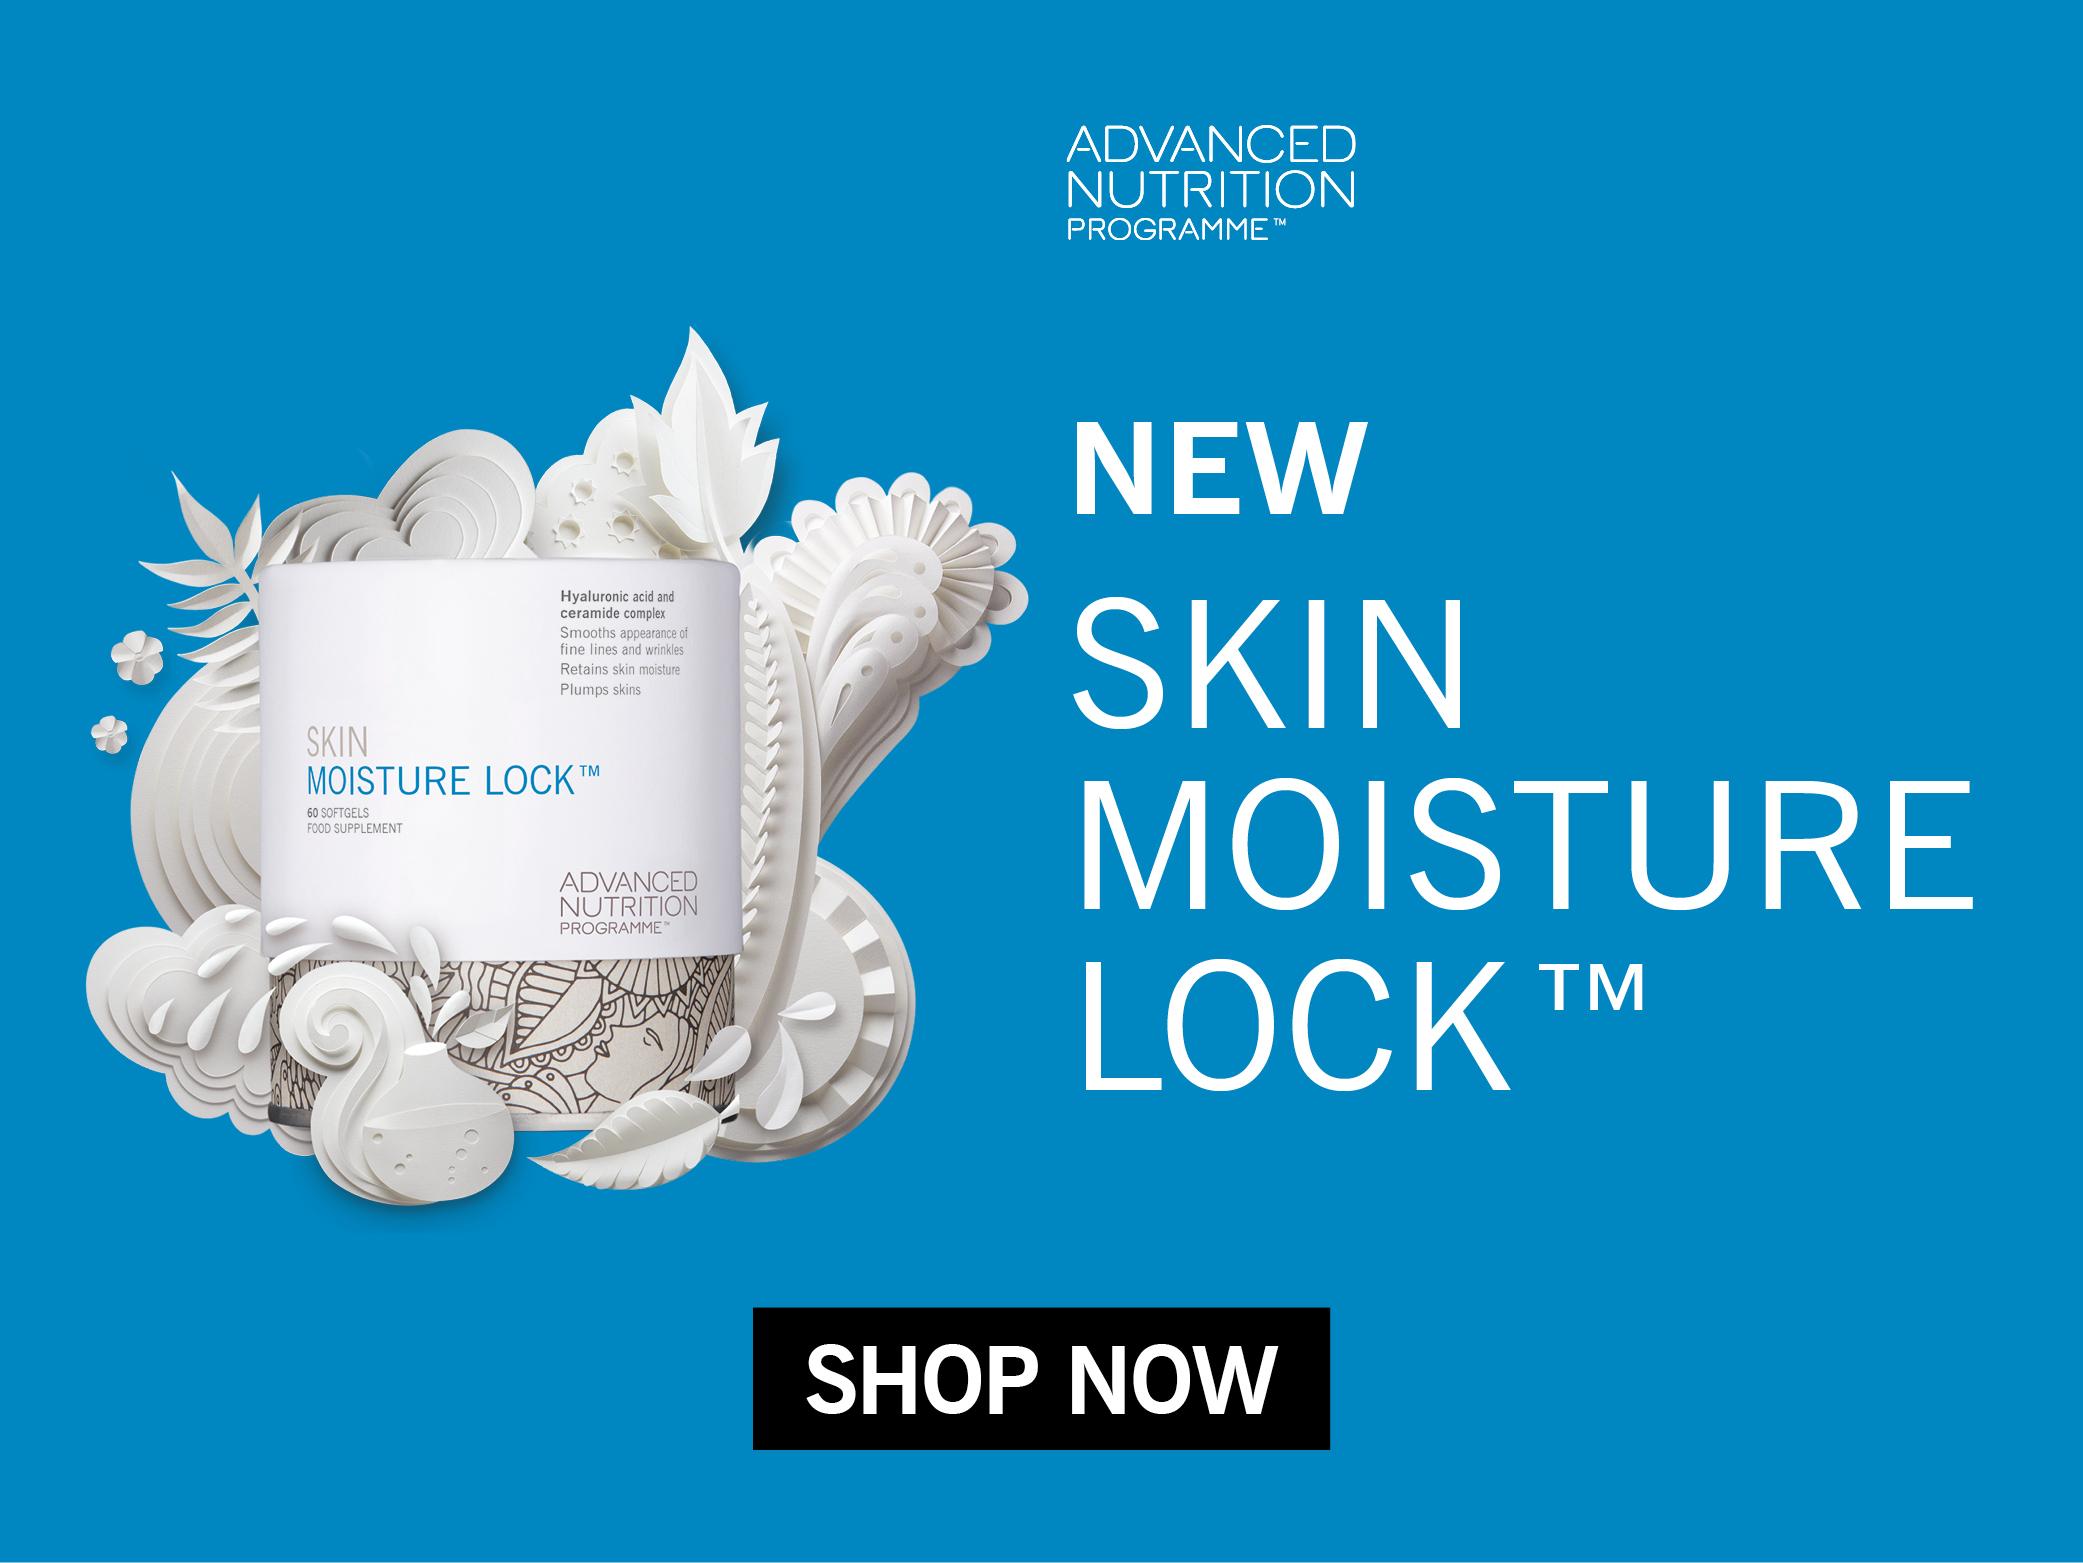 Skin Moisture Lock™ Web Banners2.jpg